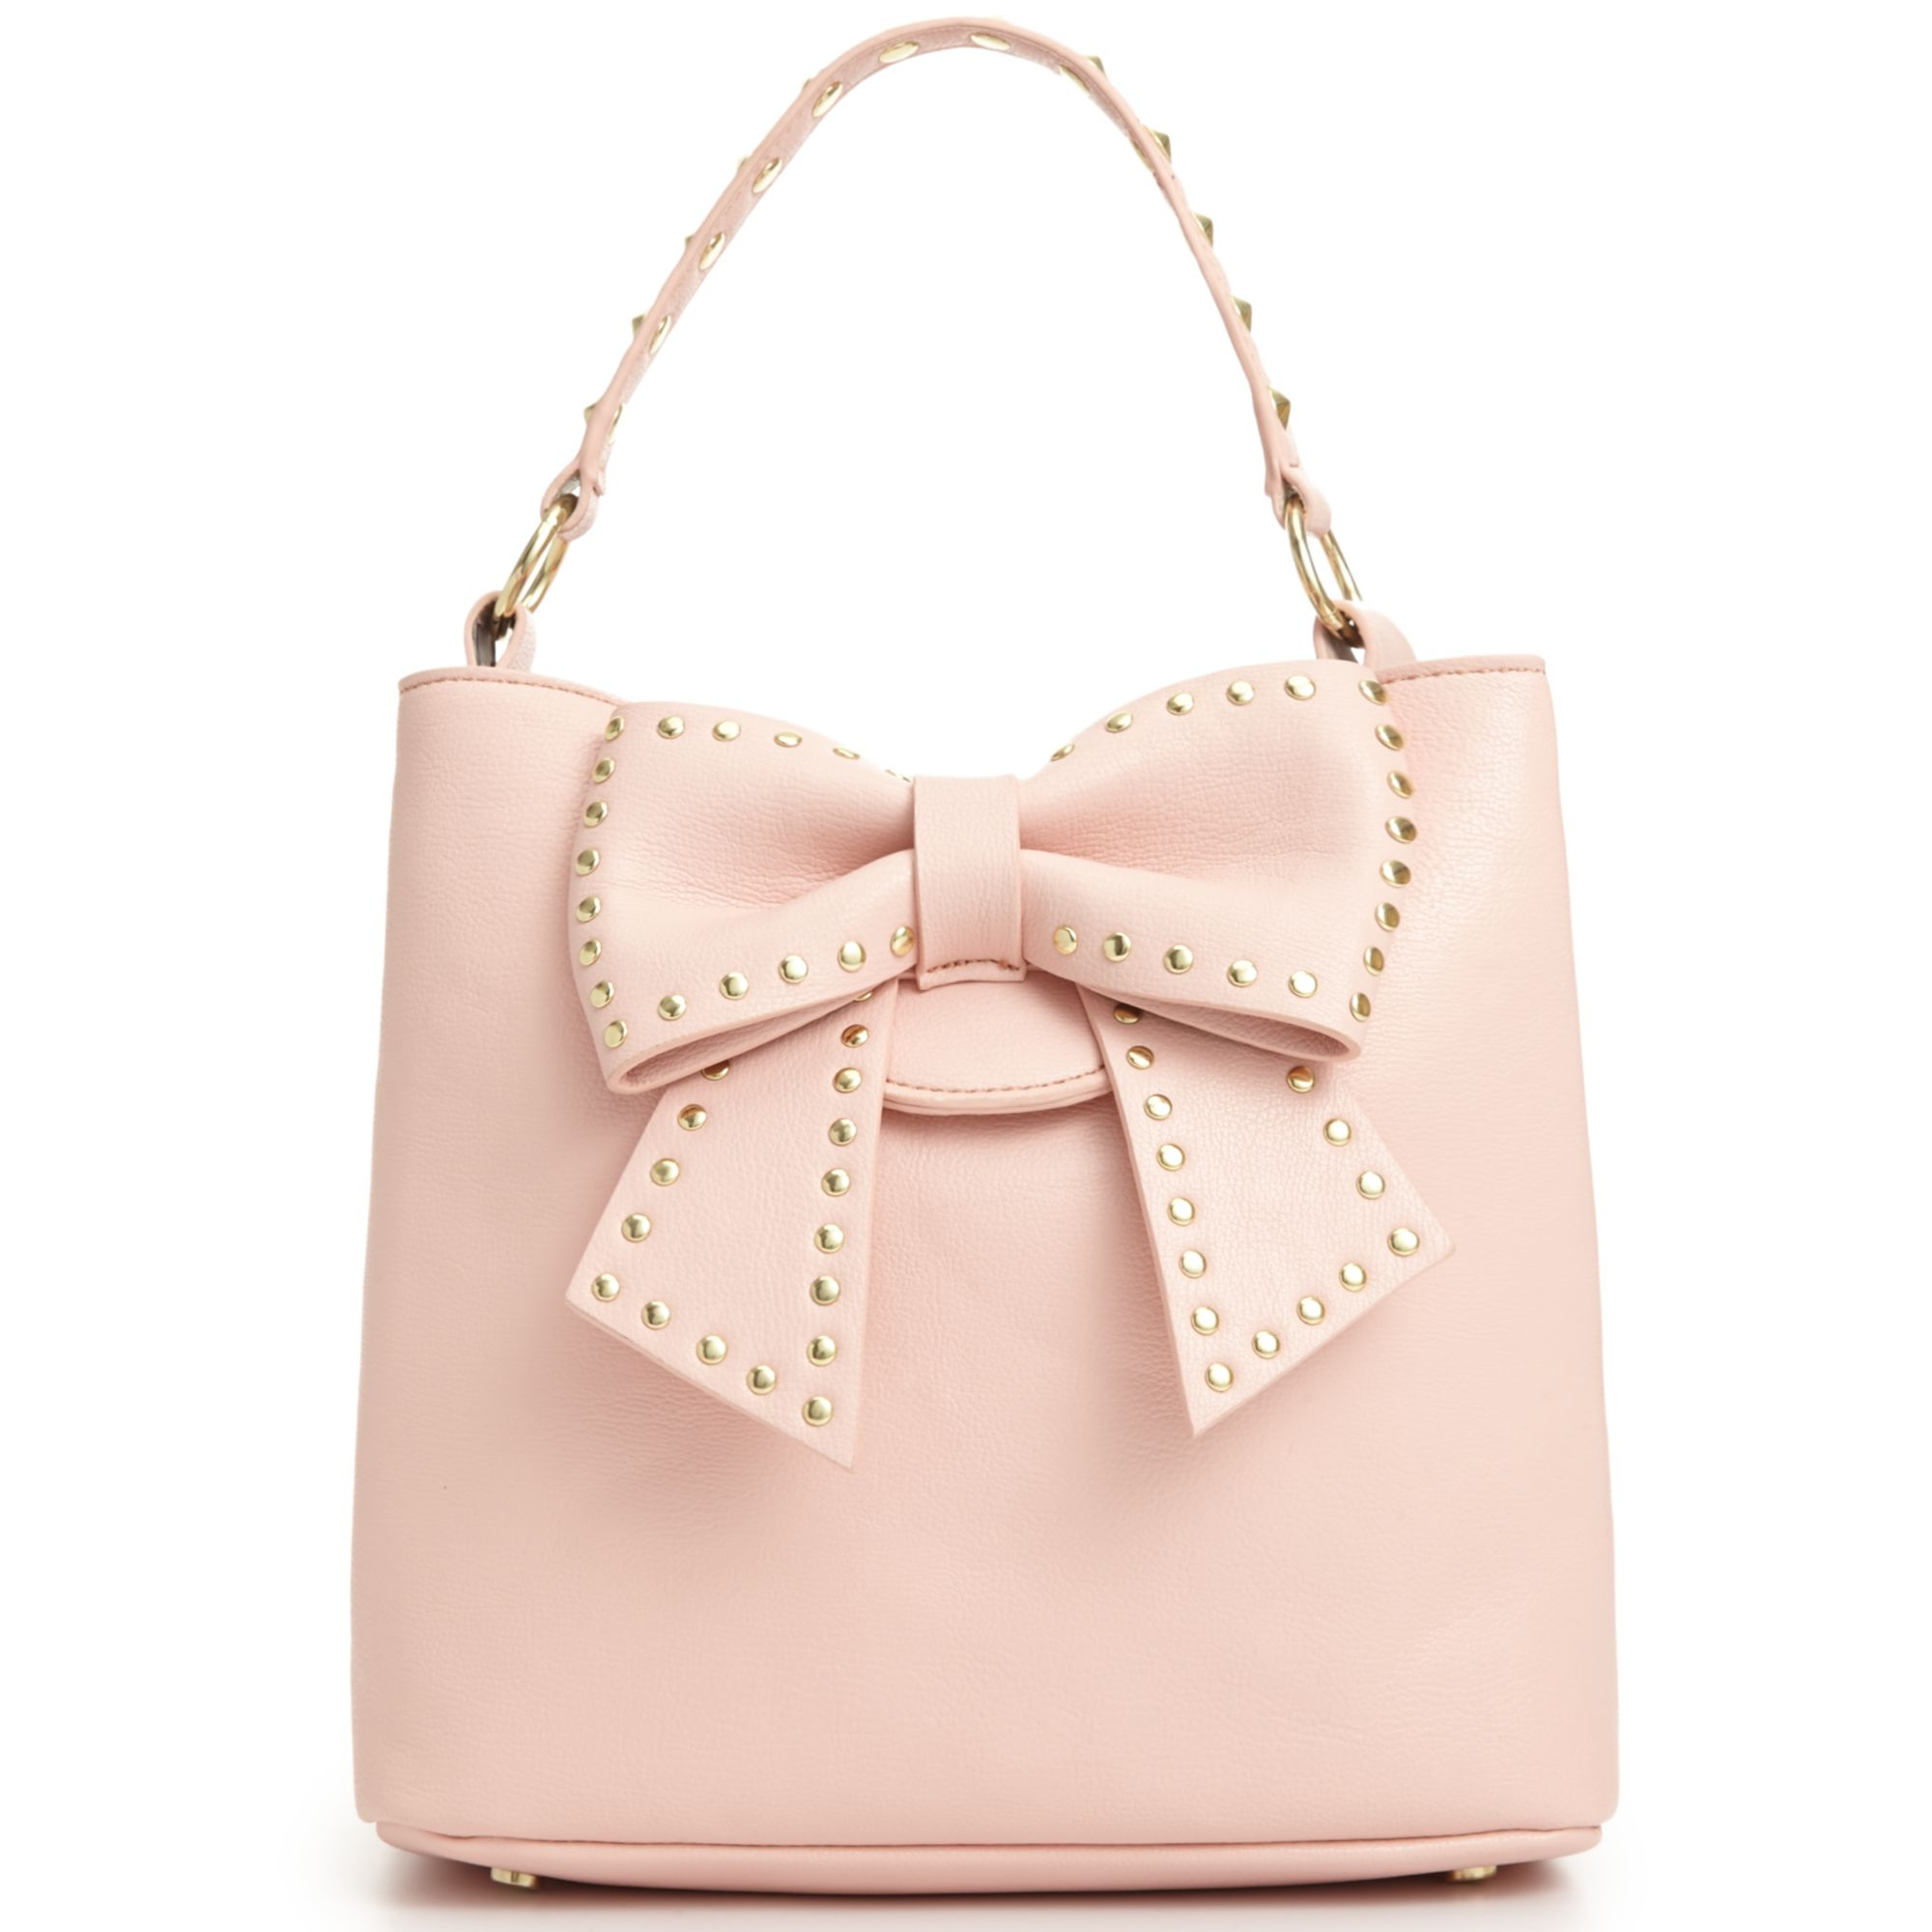 Betsey Johnson Hopeless Romantic Bucket Bag In Pink Blush